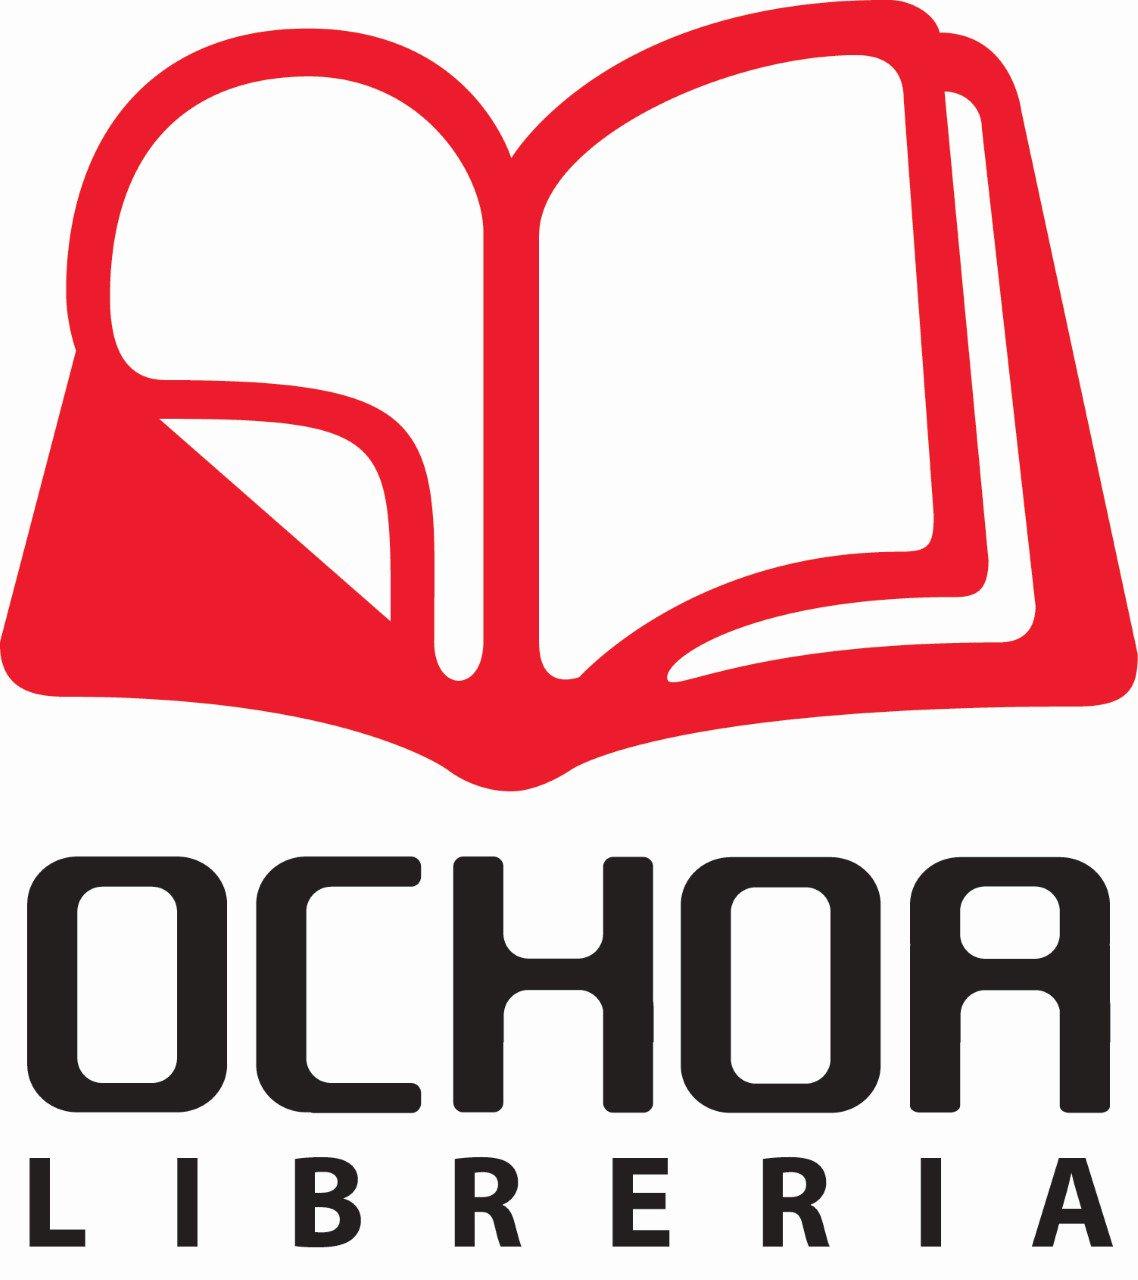 Librería Ochoa